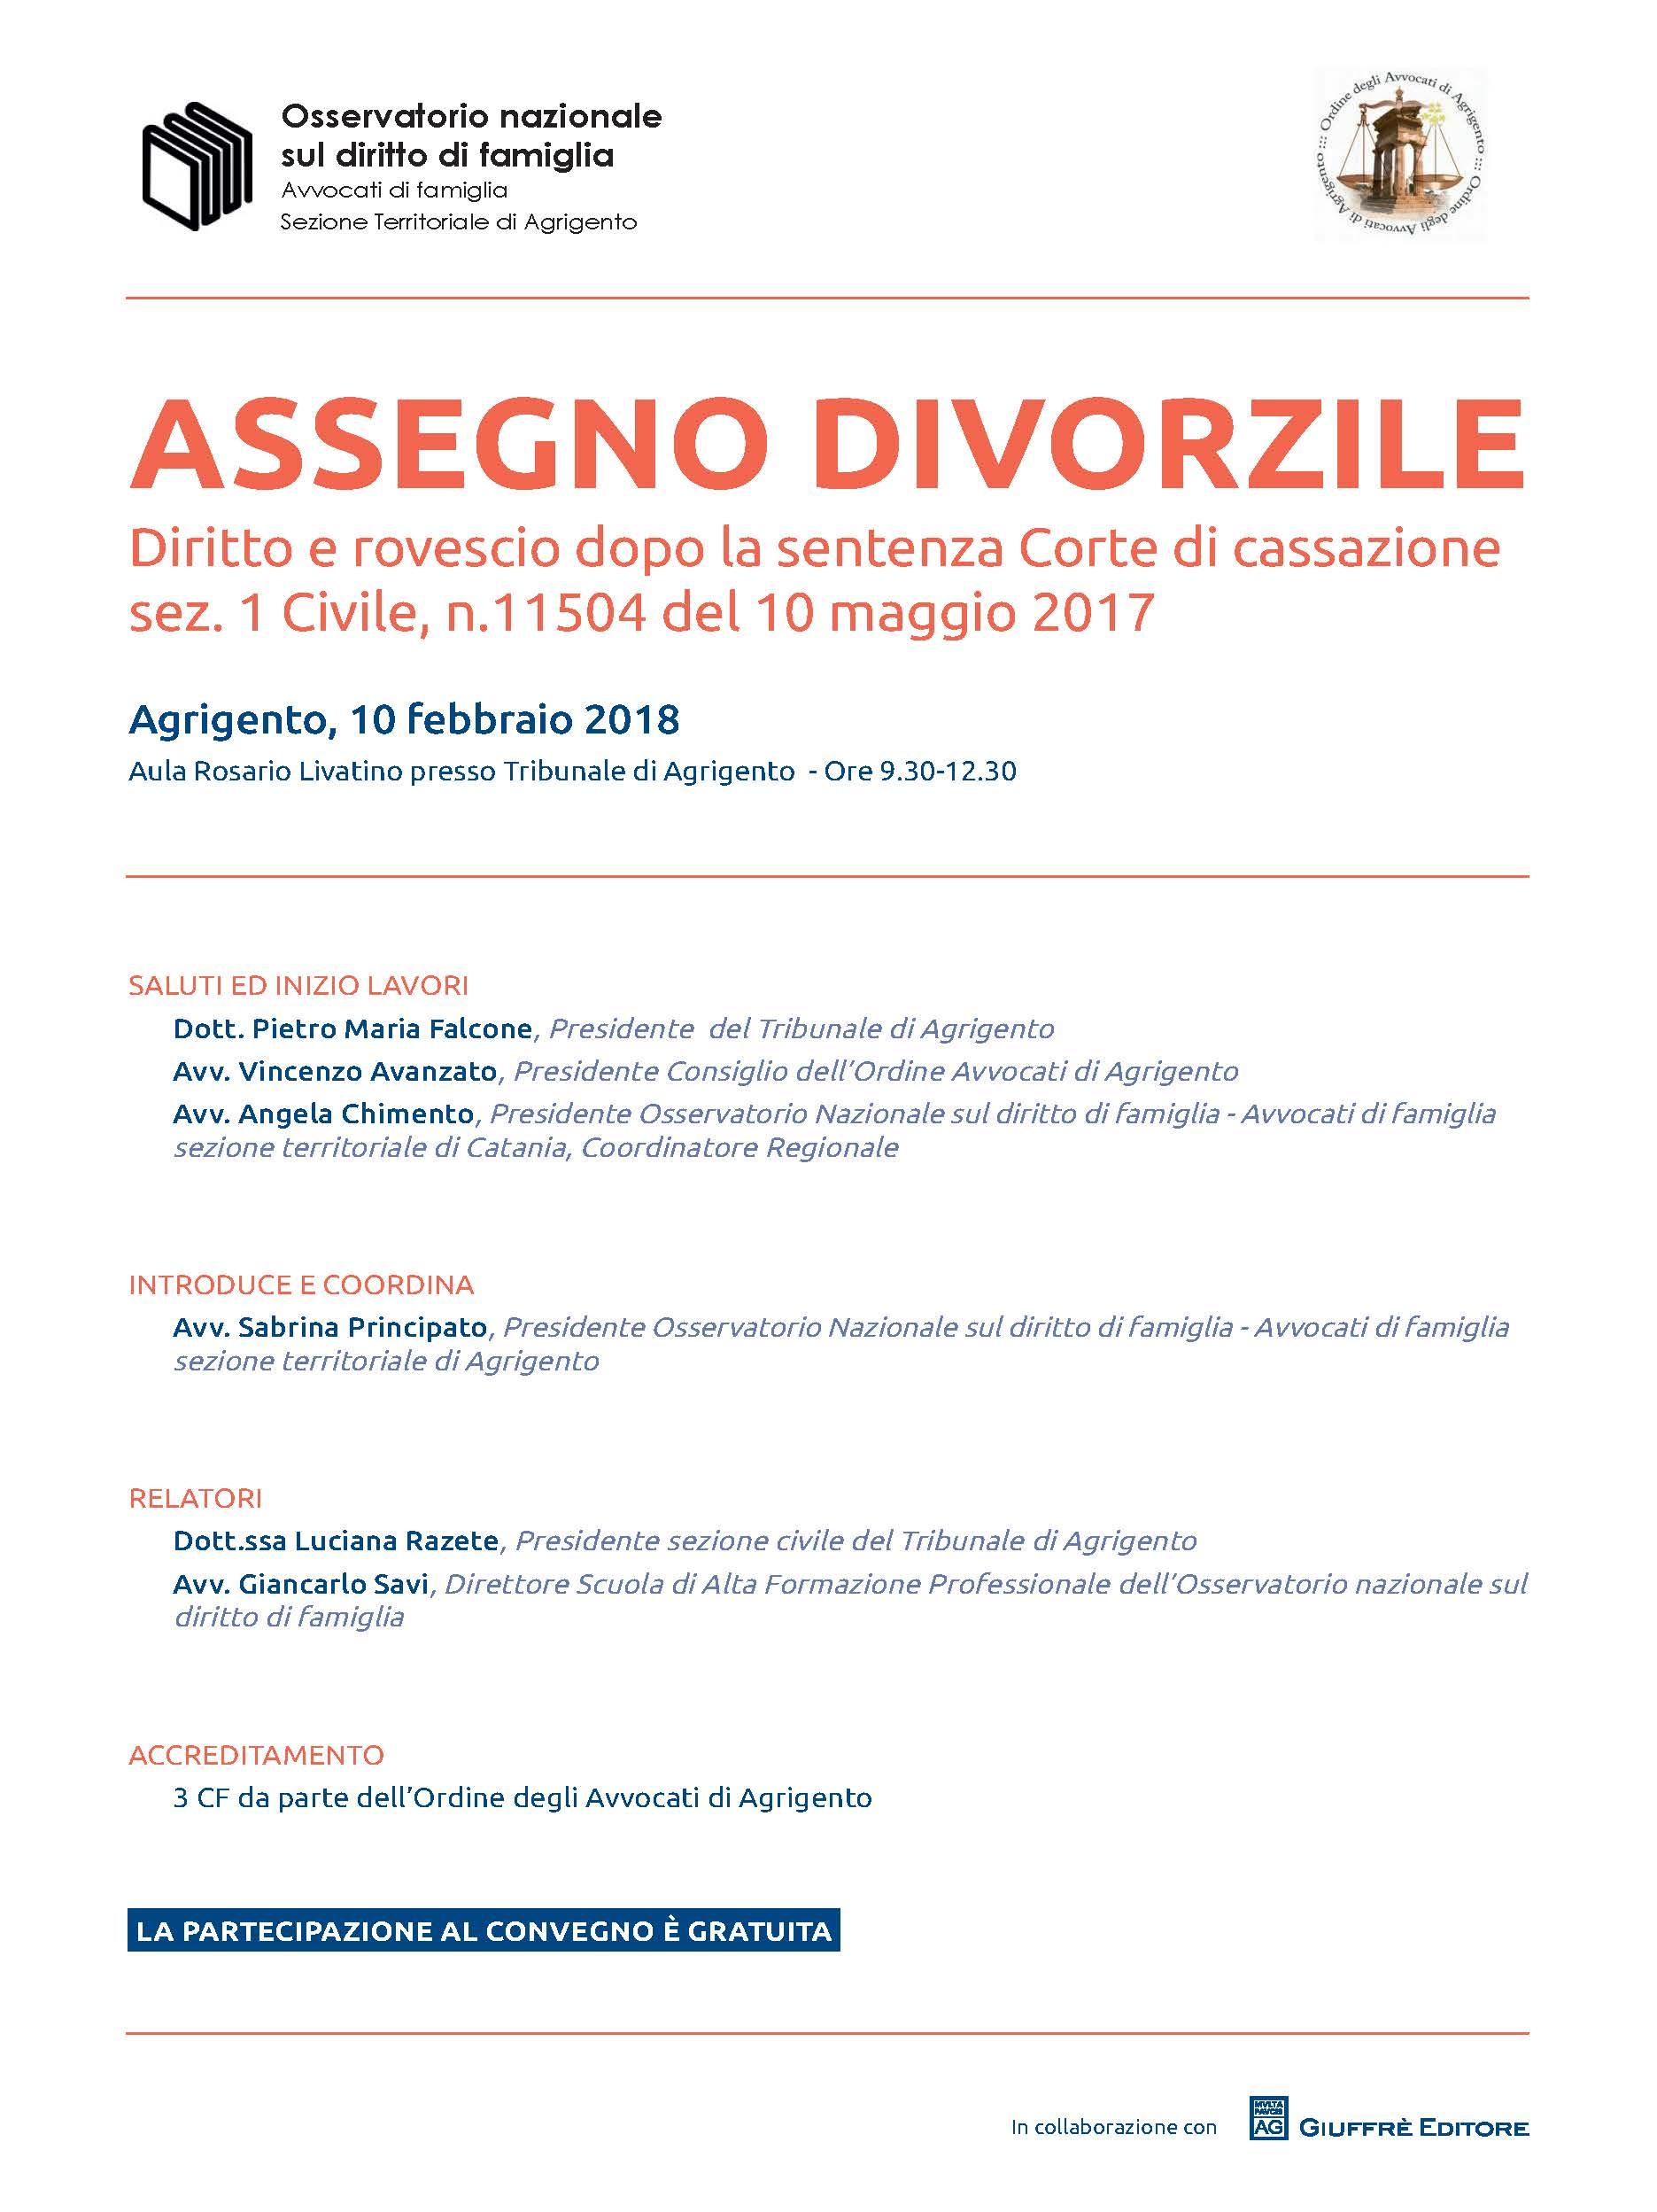 Locandina_Convegno ASSEGNO DIVORZILE Agrigento 10 febbraio 2018